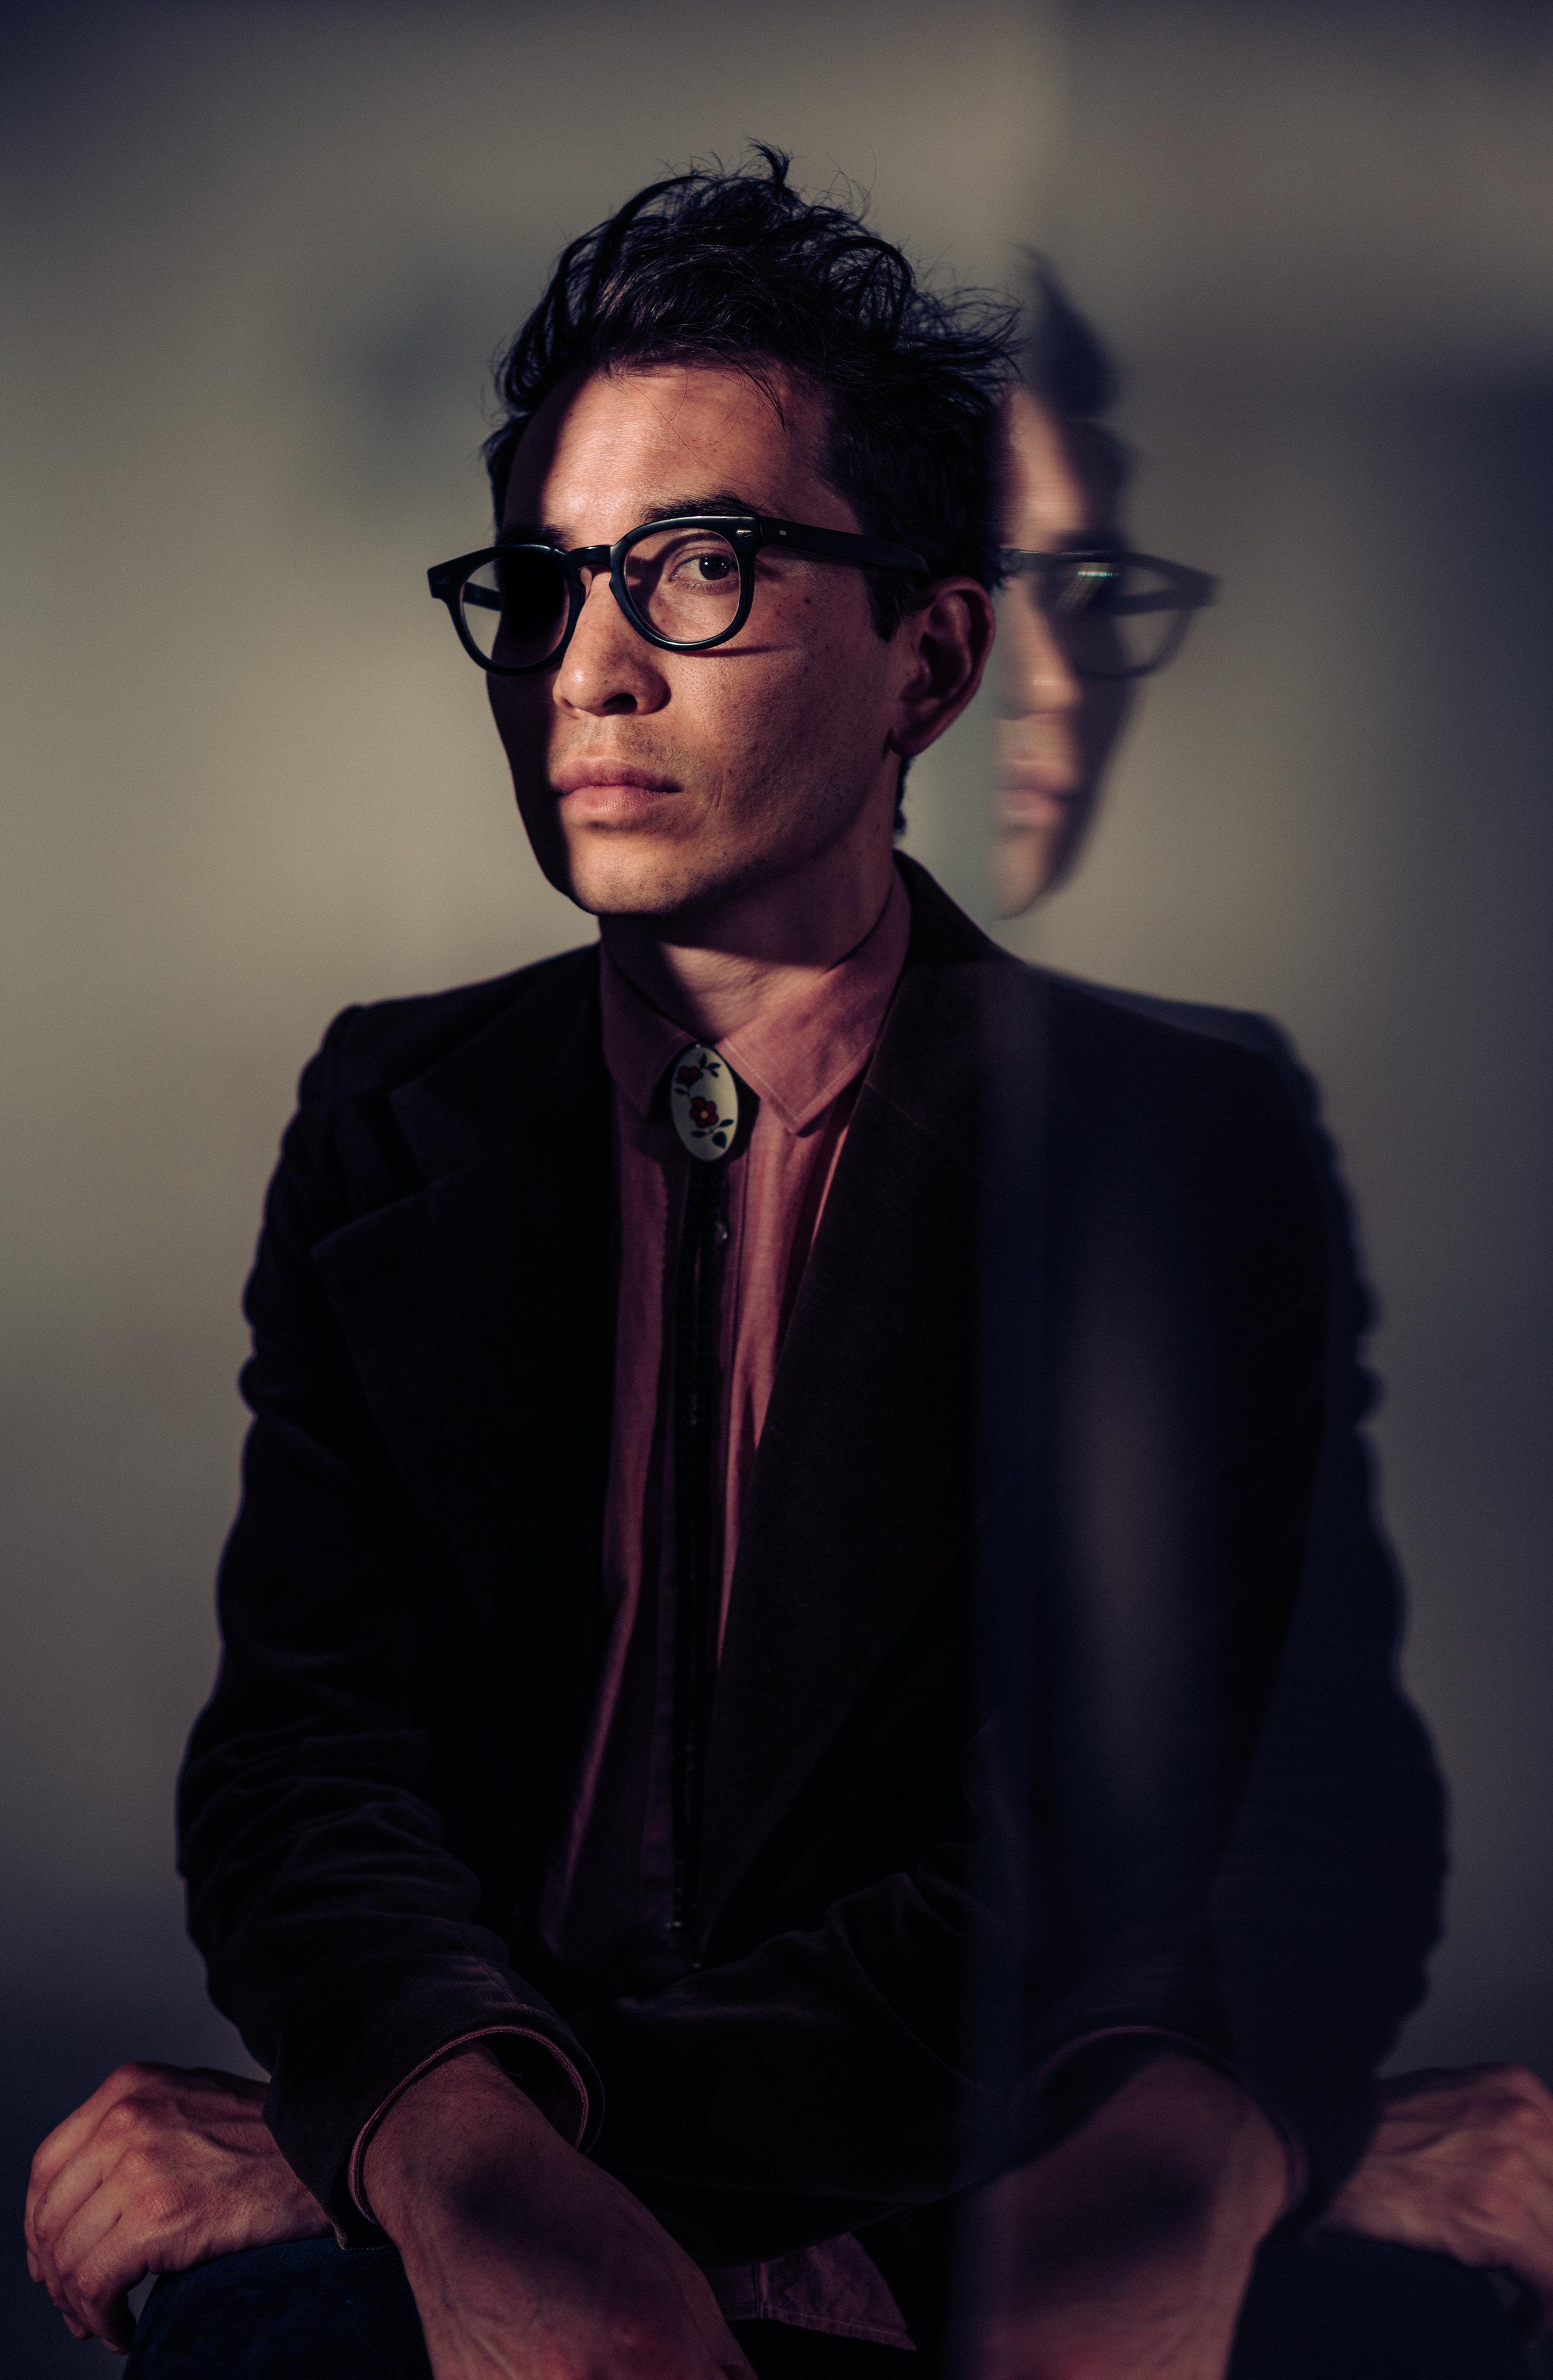 2. Jasper-Sloan-Yip-Music-Post-Meridiem-Press-Image-Nelson-Mouellic-Photo - Jasper Sloan Yip.jpg